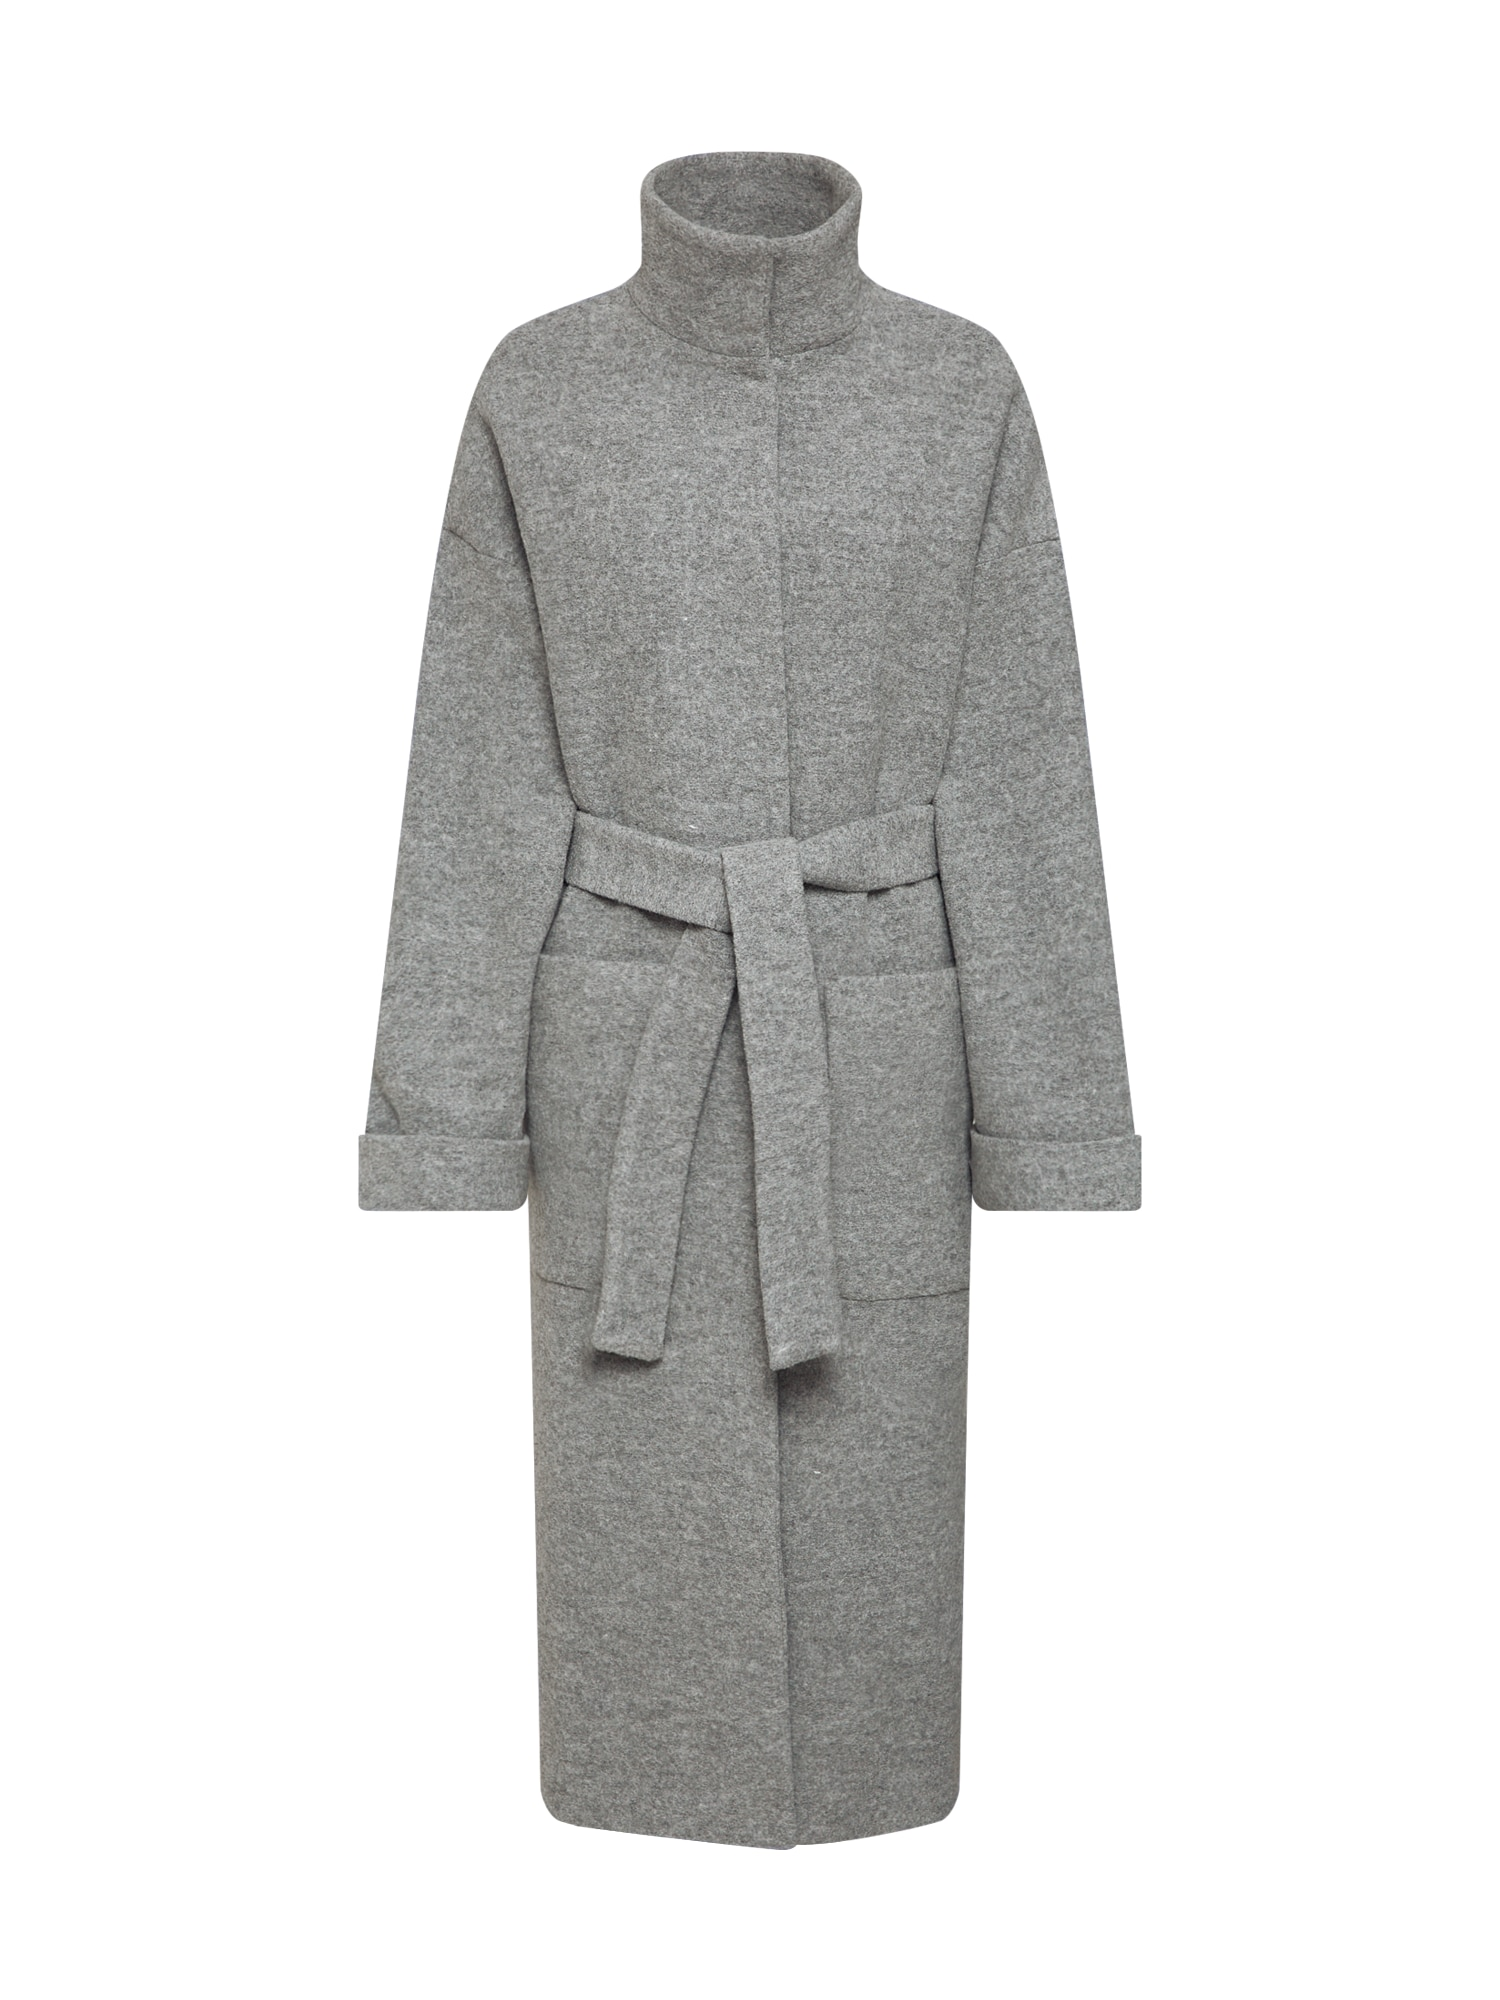 EDITED Rudeninis-žieminis paltas 'Yona' pilka / margai pilka